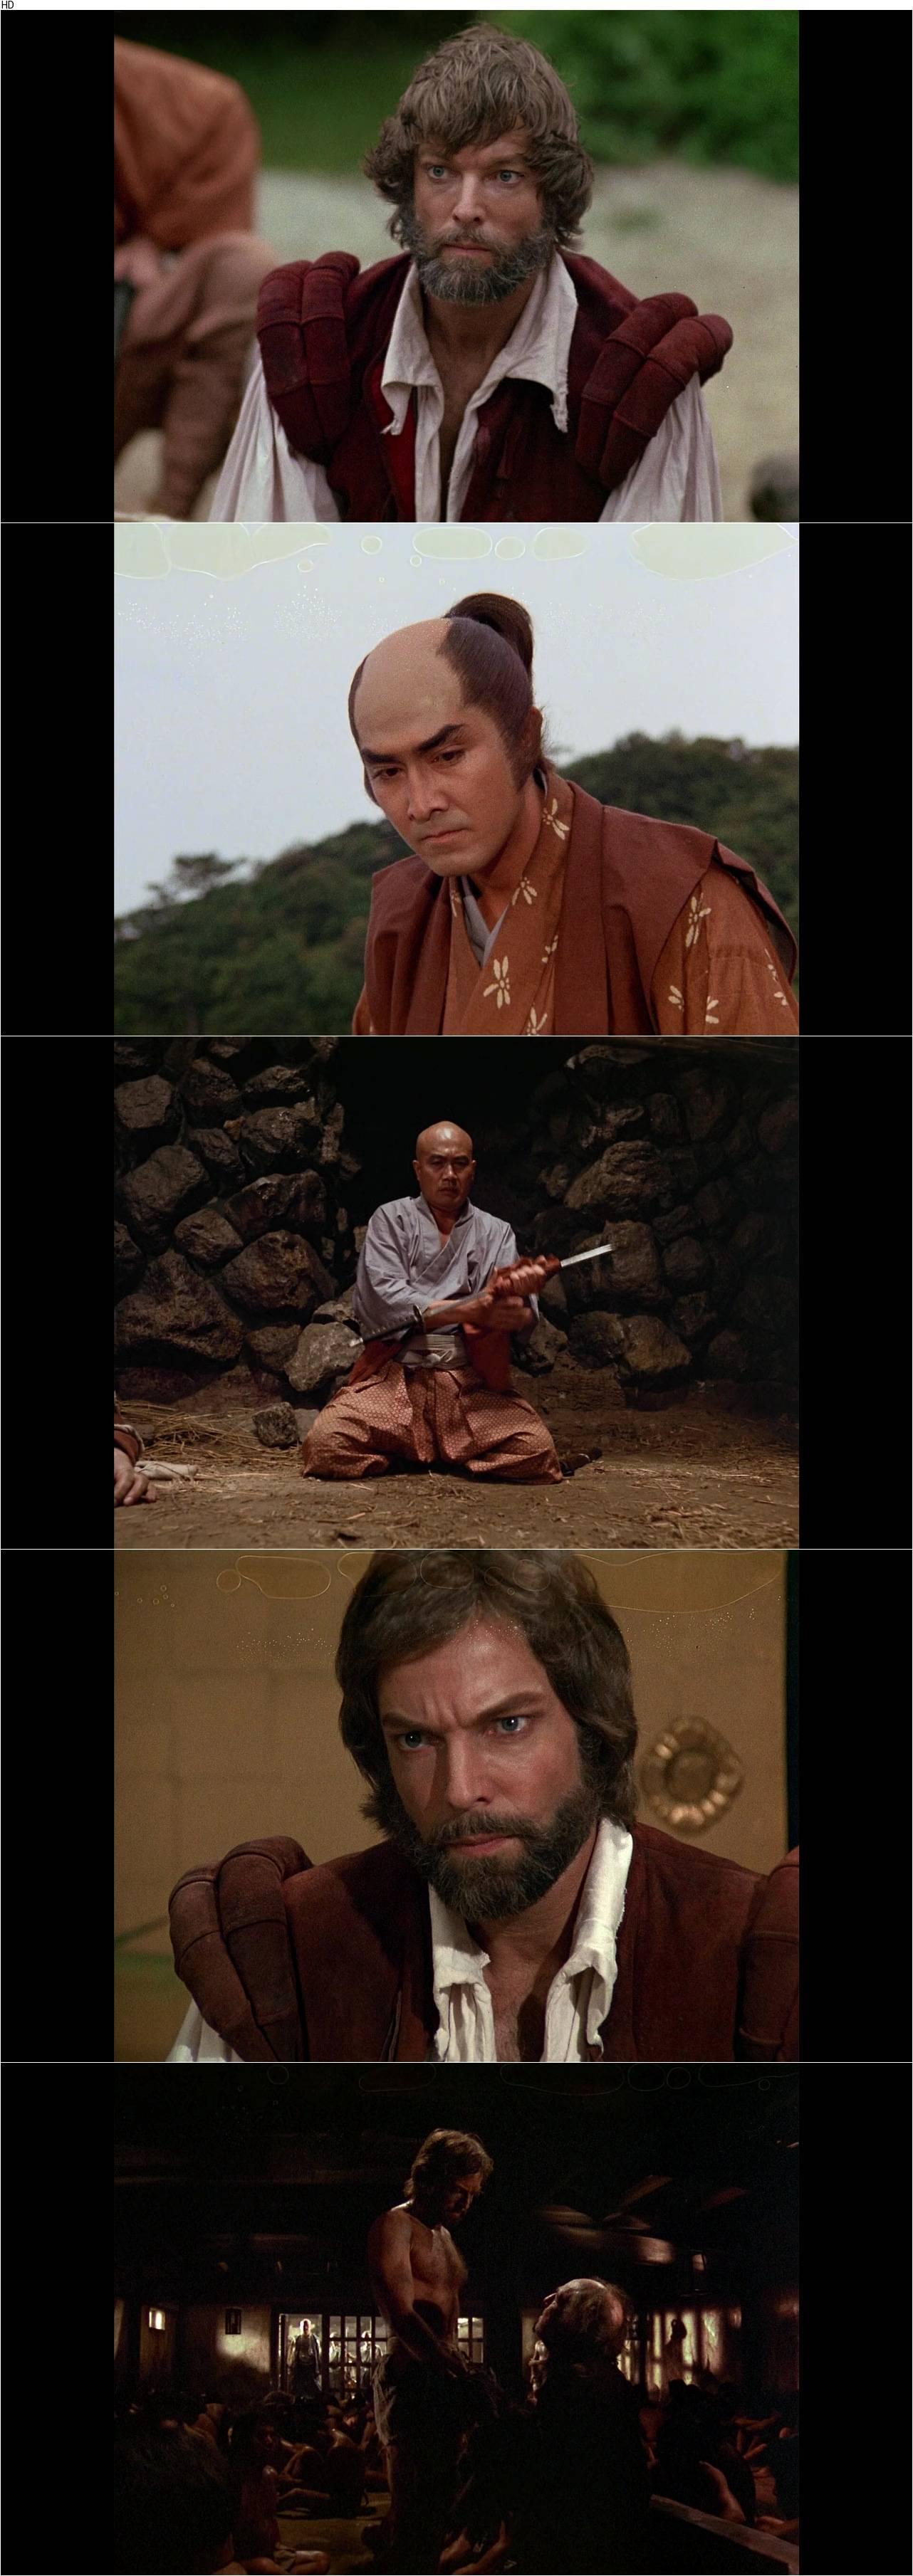 James Clavell's Shogun (1980)